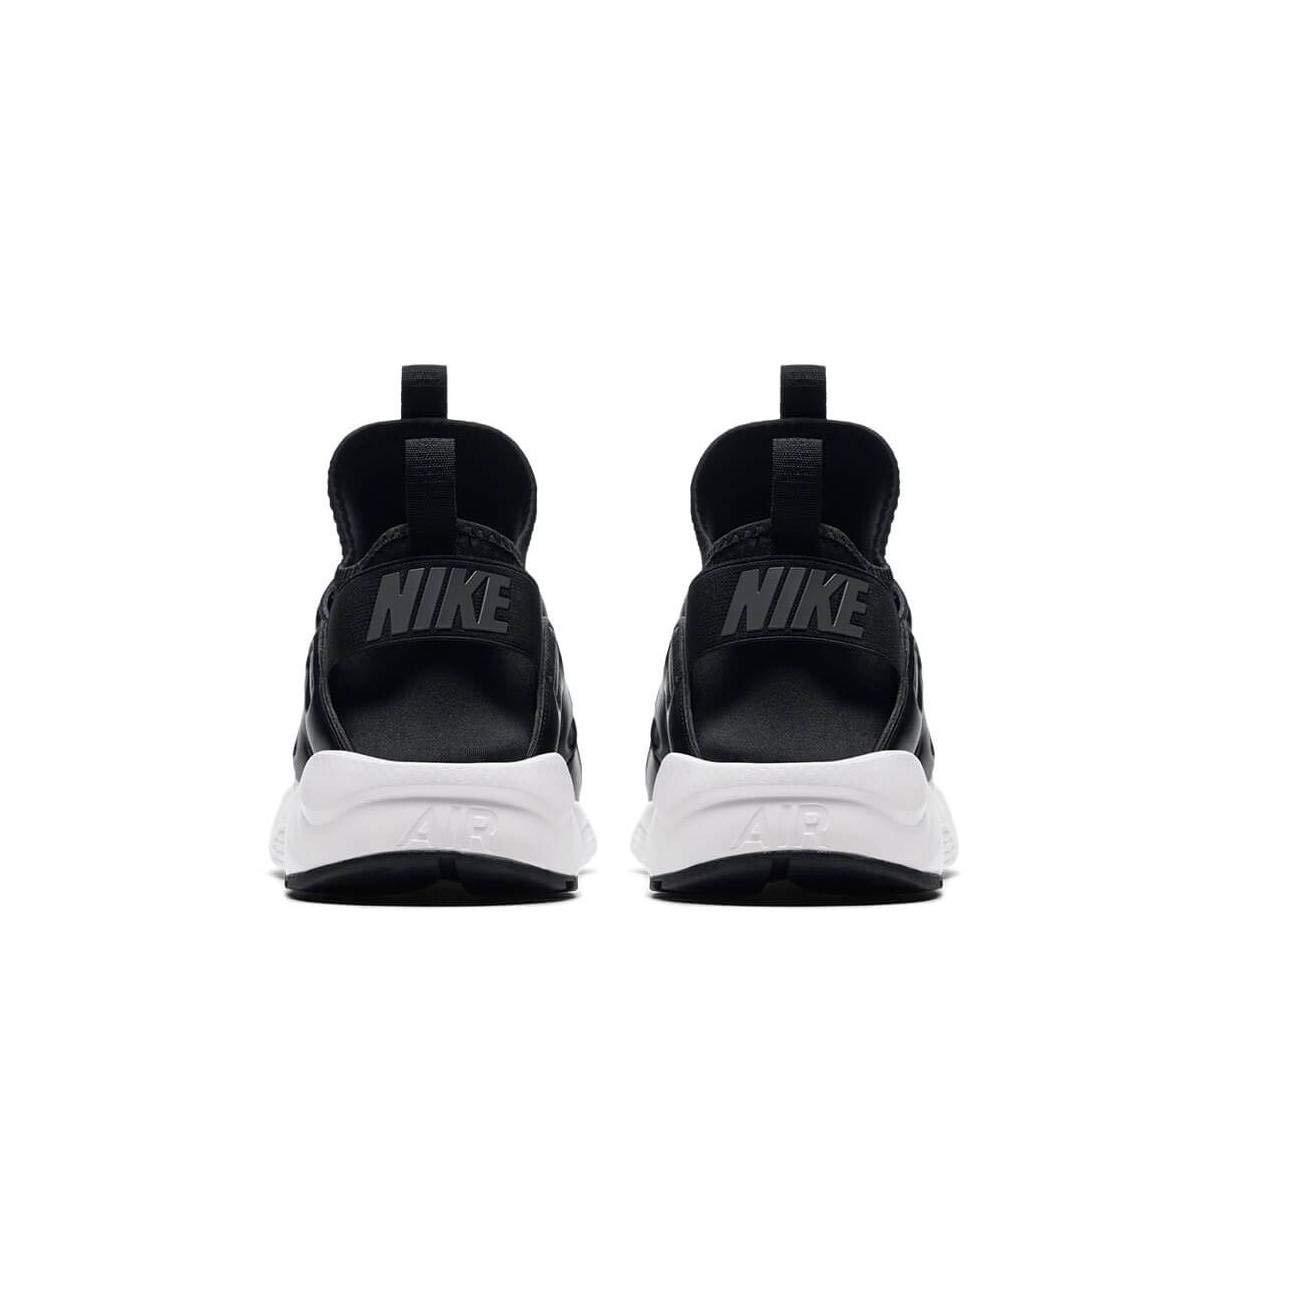 Nike Herren Herren Herren Air Huarache Run Ultra Se Gymnastikschuhe B07CSQNKBN Sport- & Outdoorschuhe Aktuelle Form 2c899b